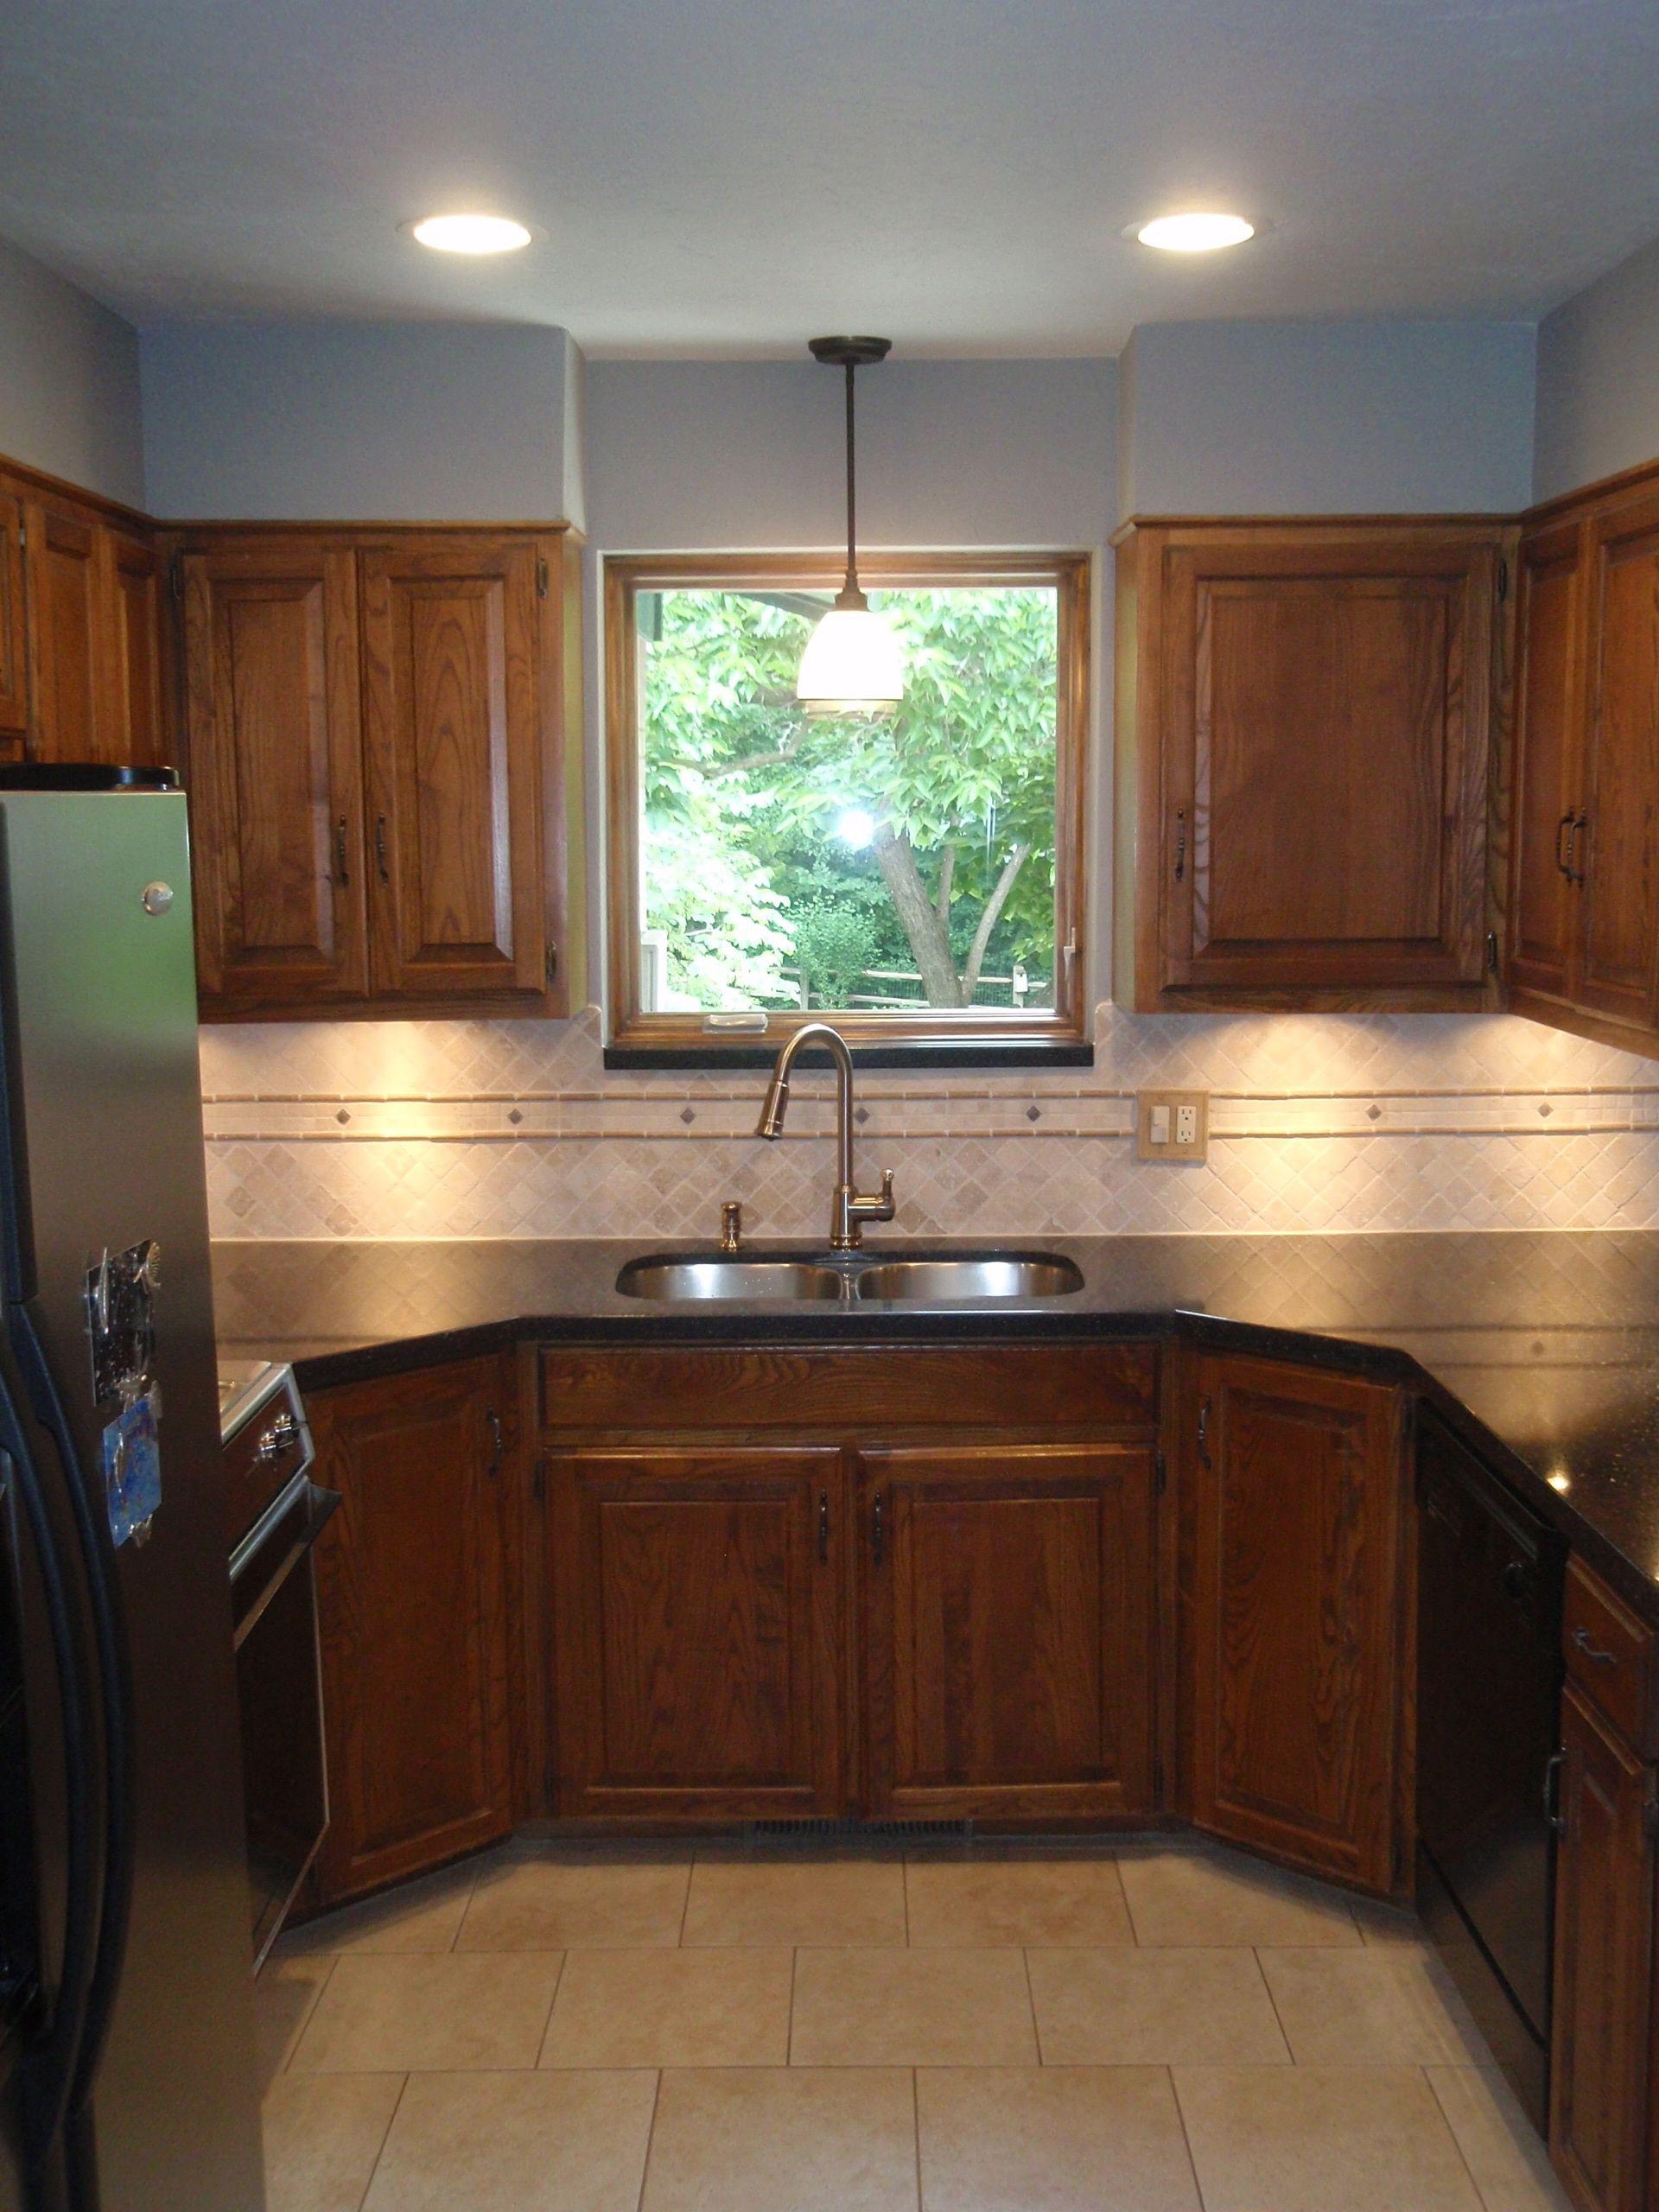 Oklahoma City Edmond Kitchen Remodel We Removed The S Light - Kitchen remodel okc